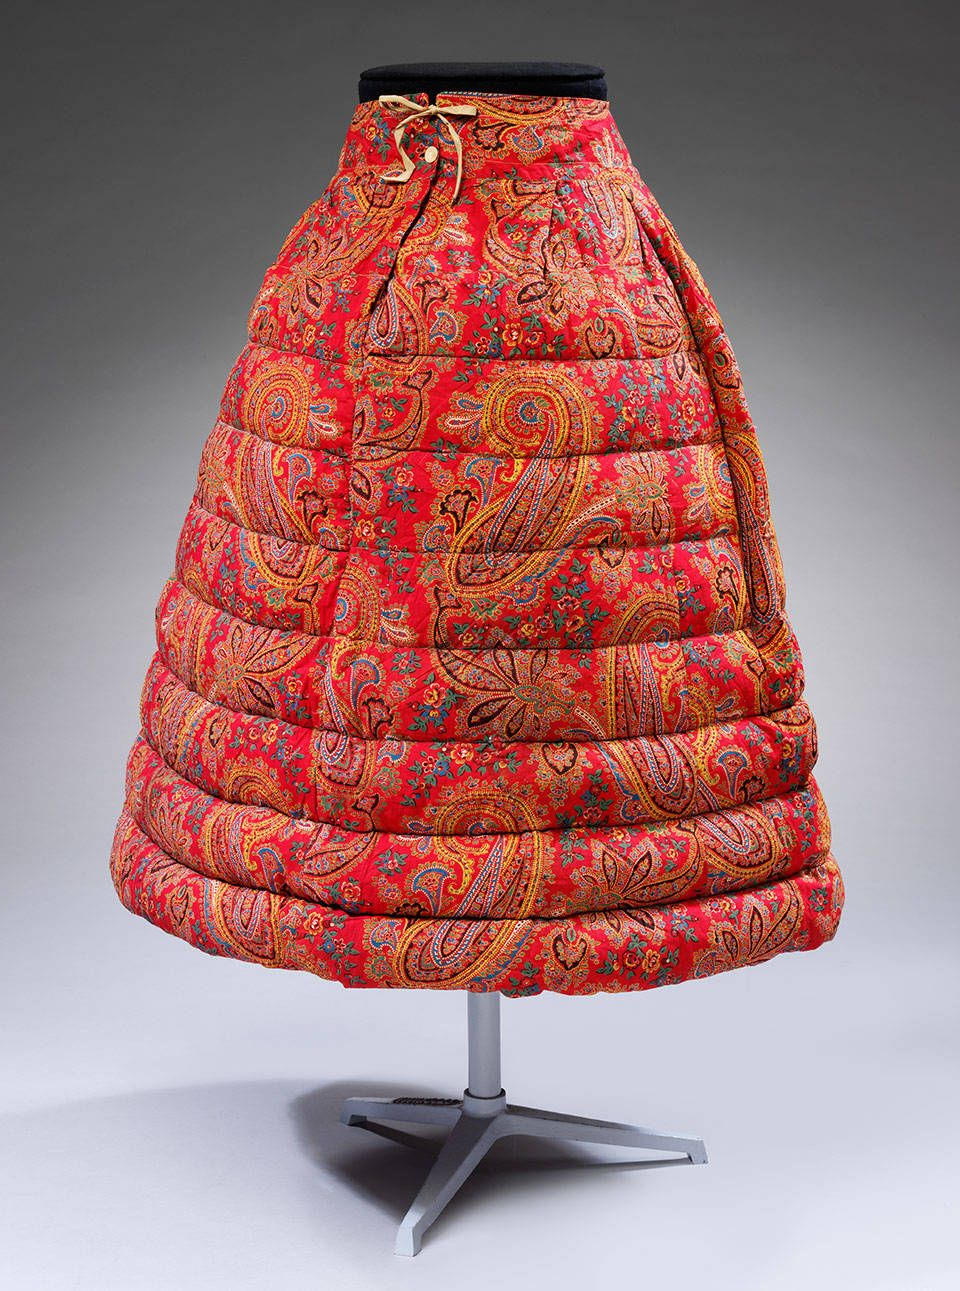 Red Paisley Cotton 18th Century Petticoat Skirt